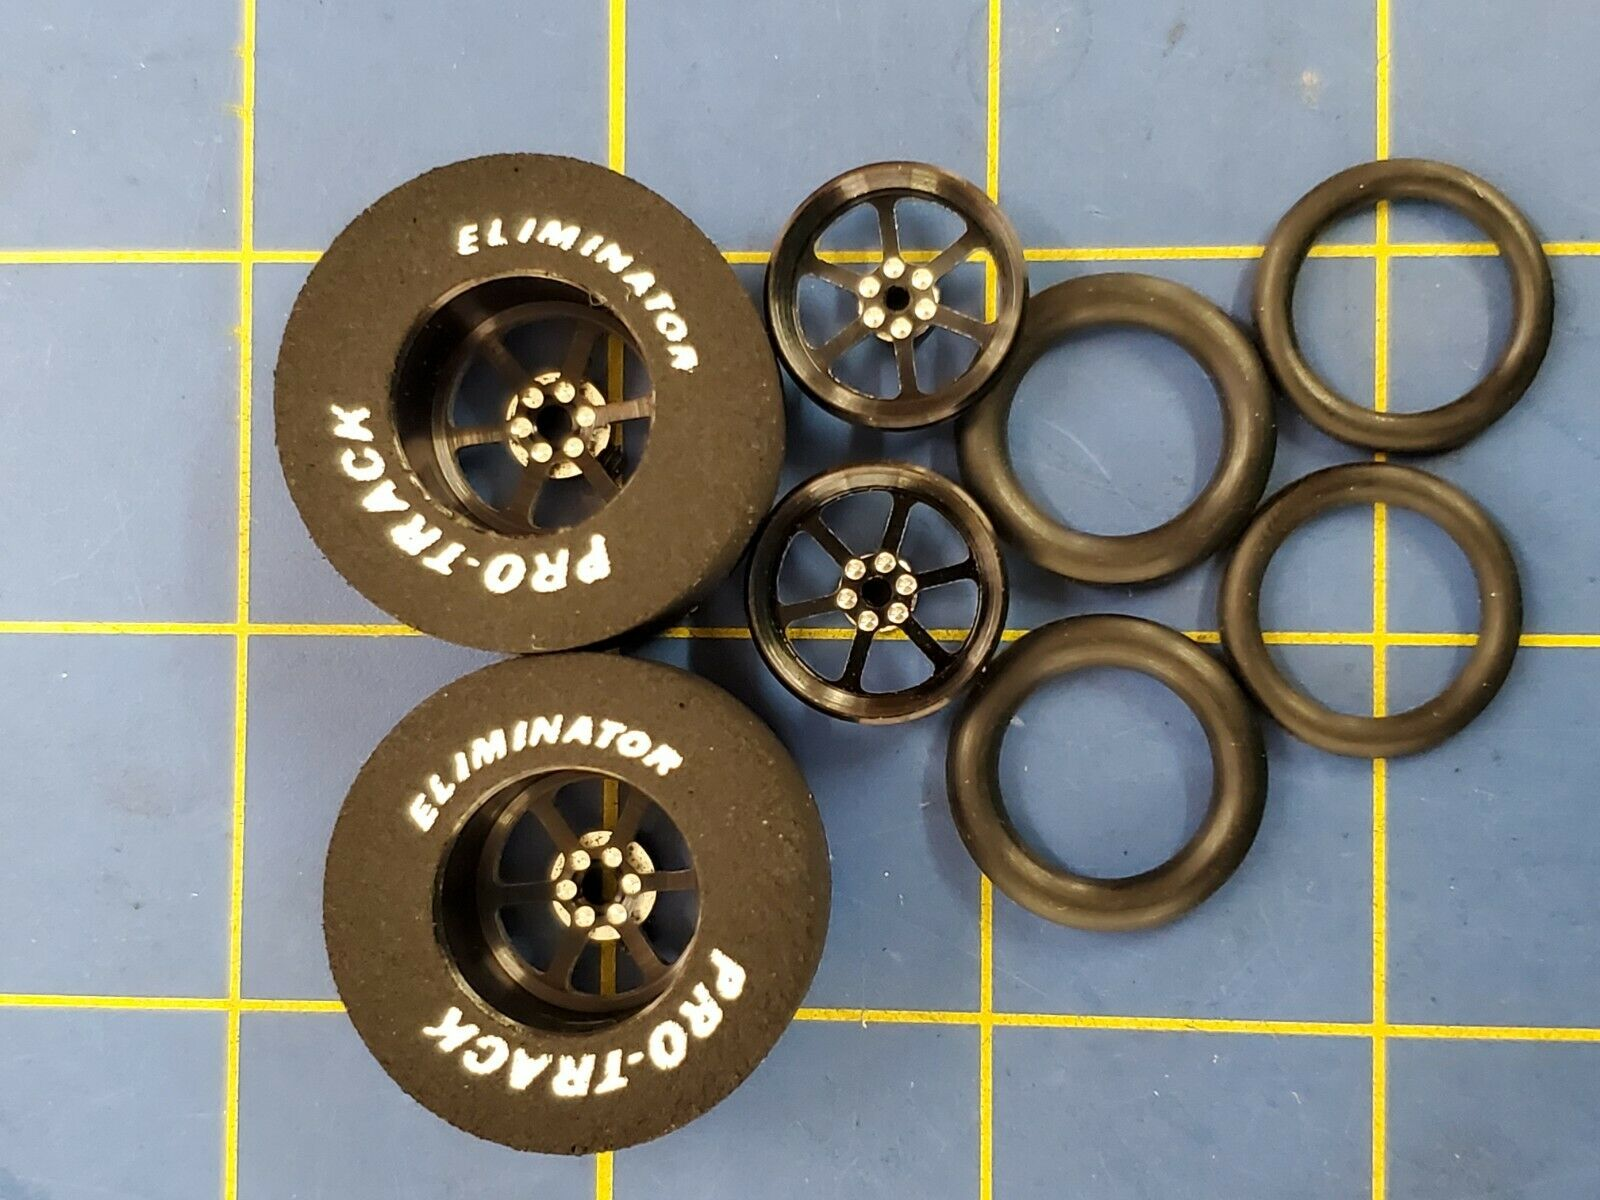 Pro Track N408E Black Turbine 1 3//16 x 500 Rear Drag Tires Mid America